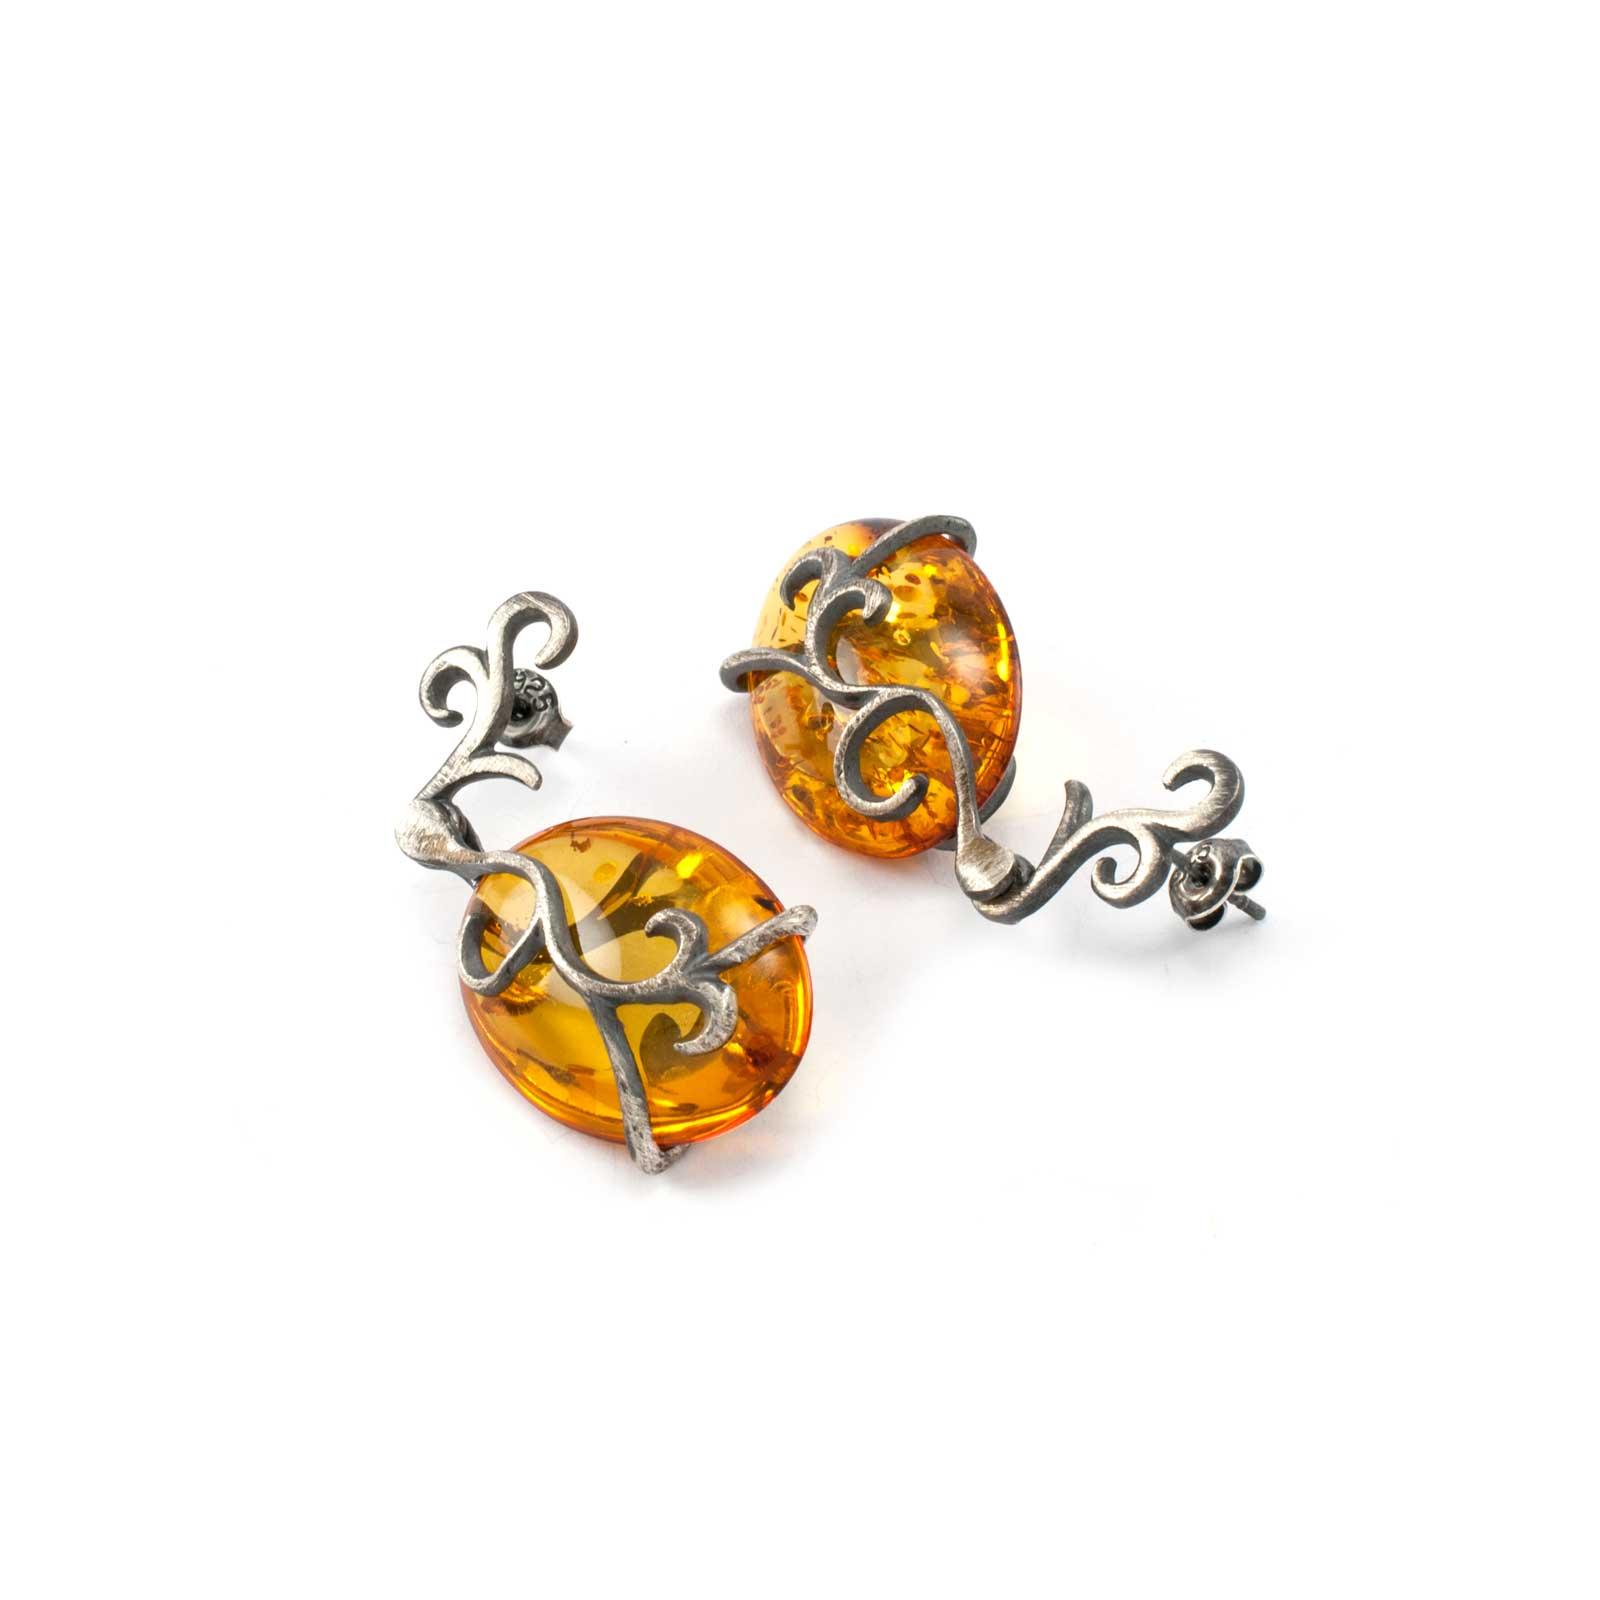 Vintage Earrings in Sterling Silver and Cognac Amber